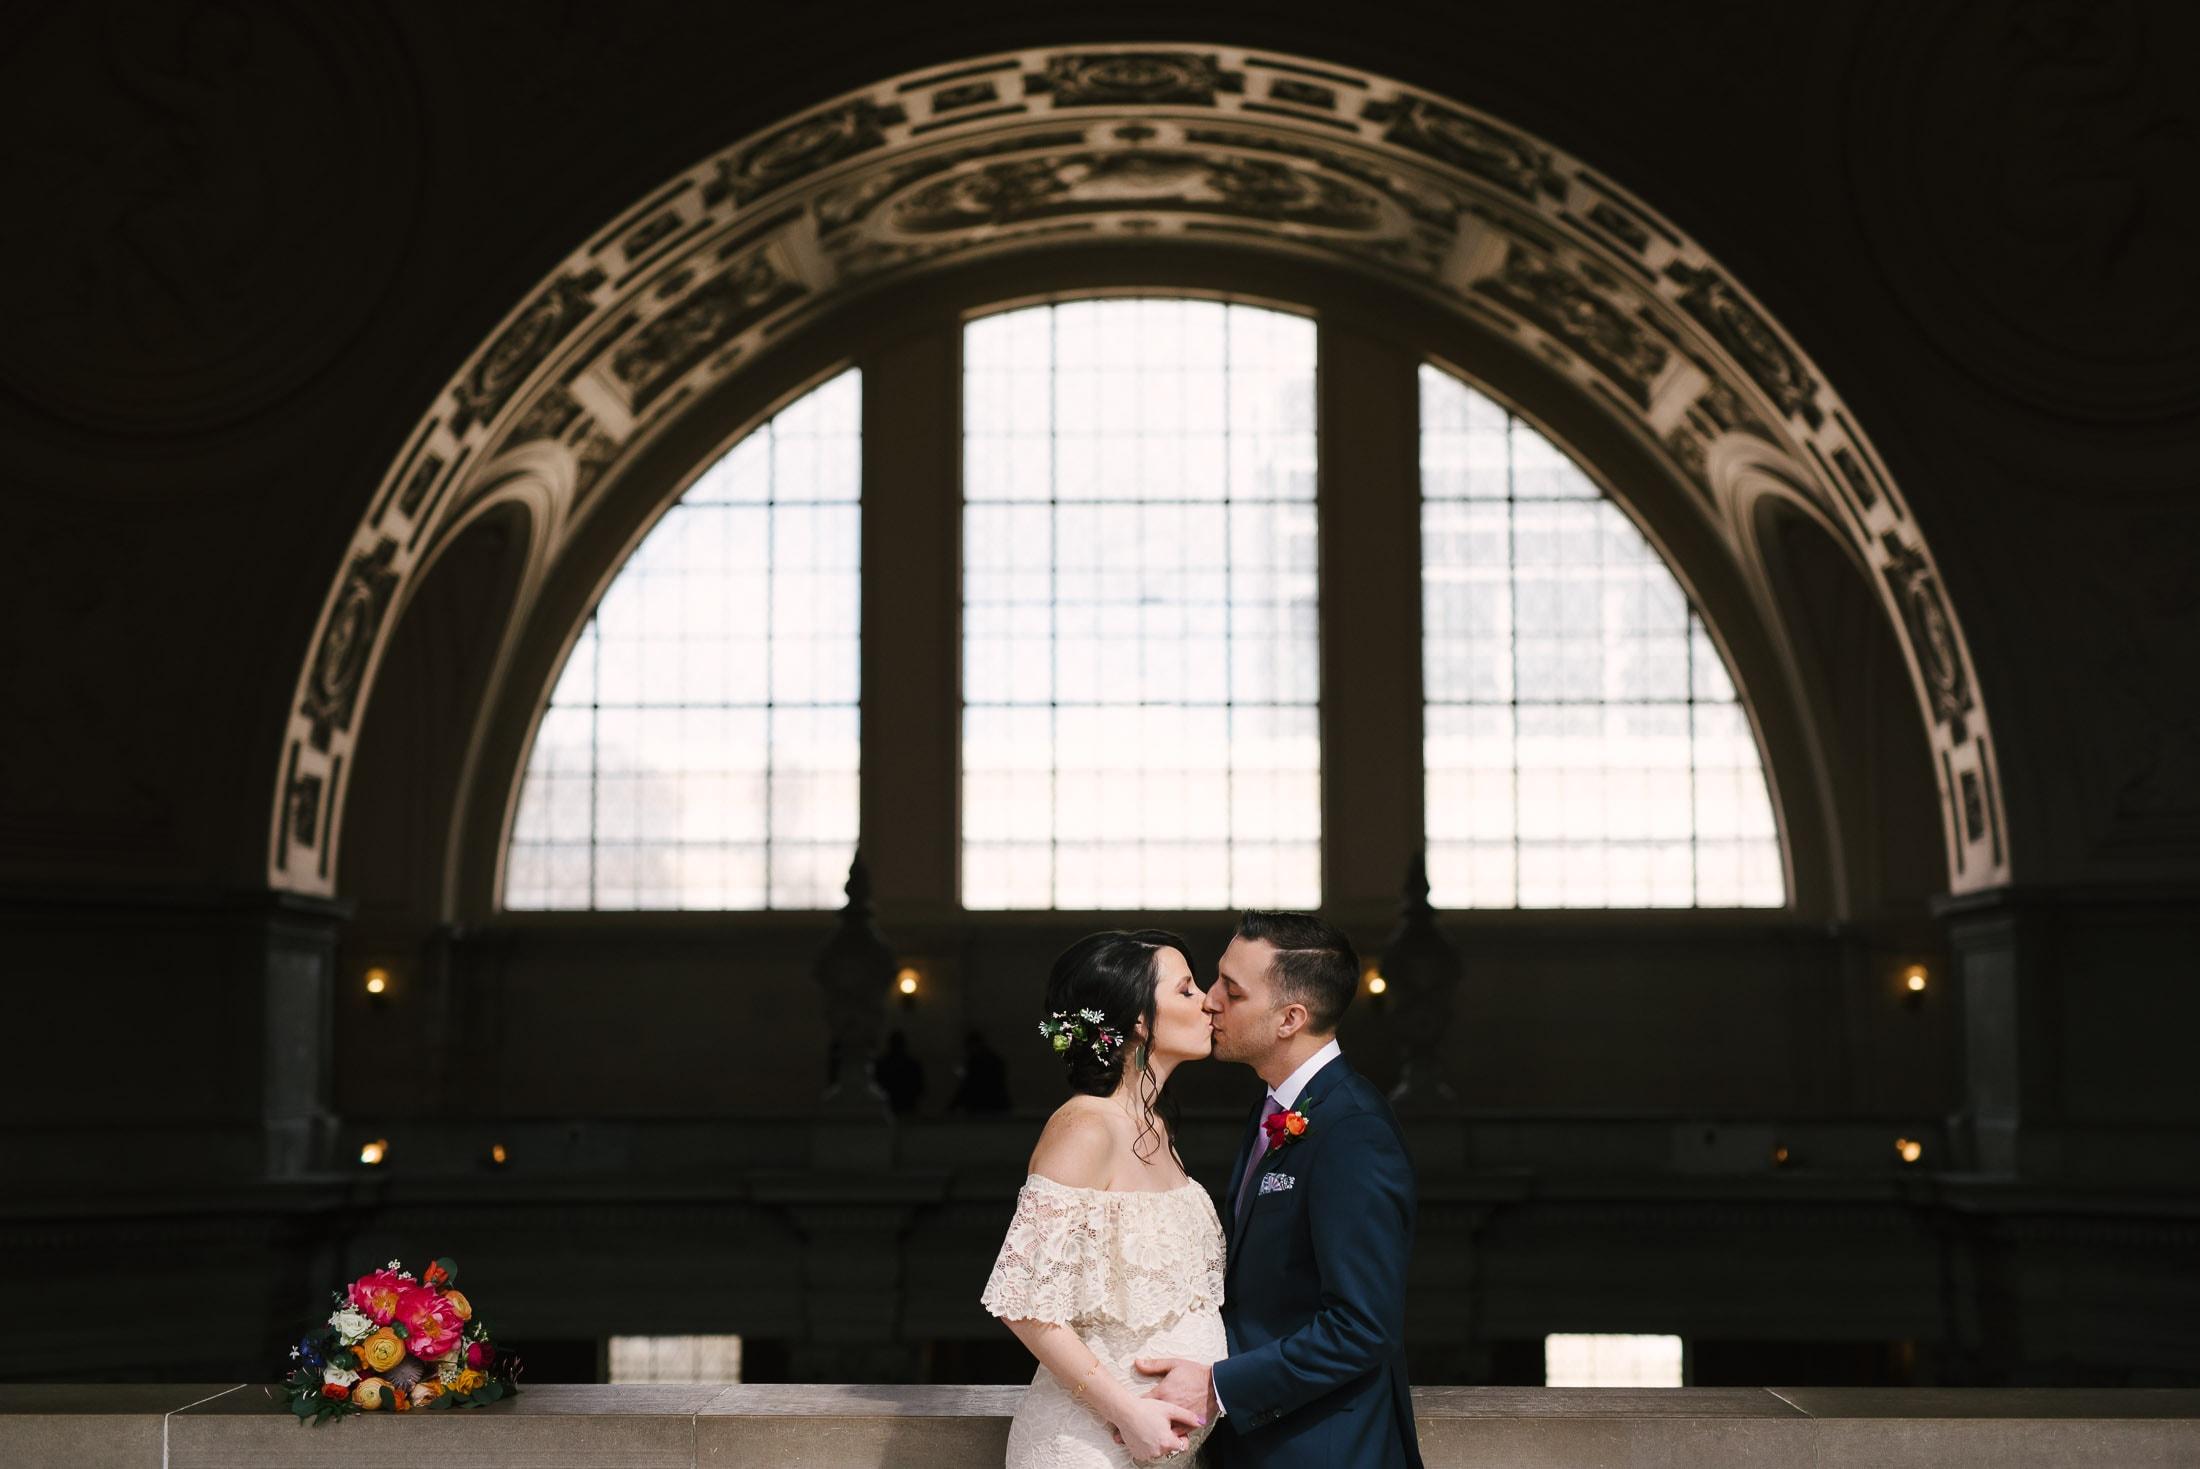 San Francisco City Hall Wedding 4th Floor